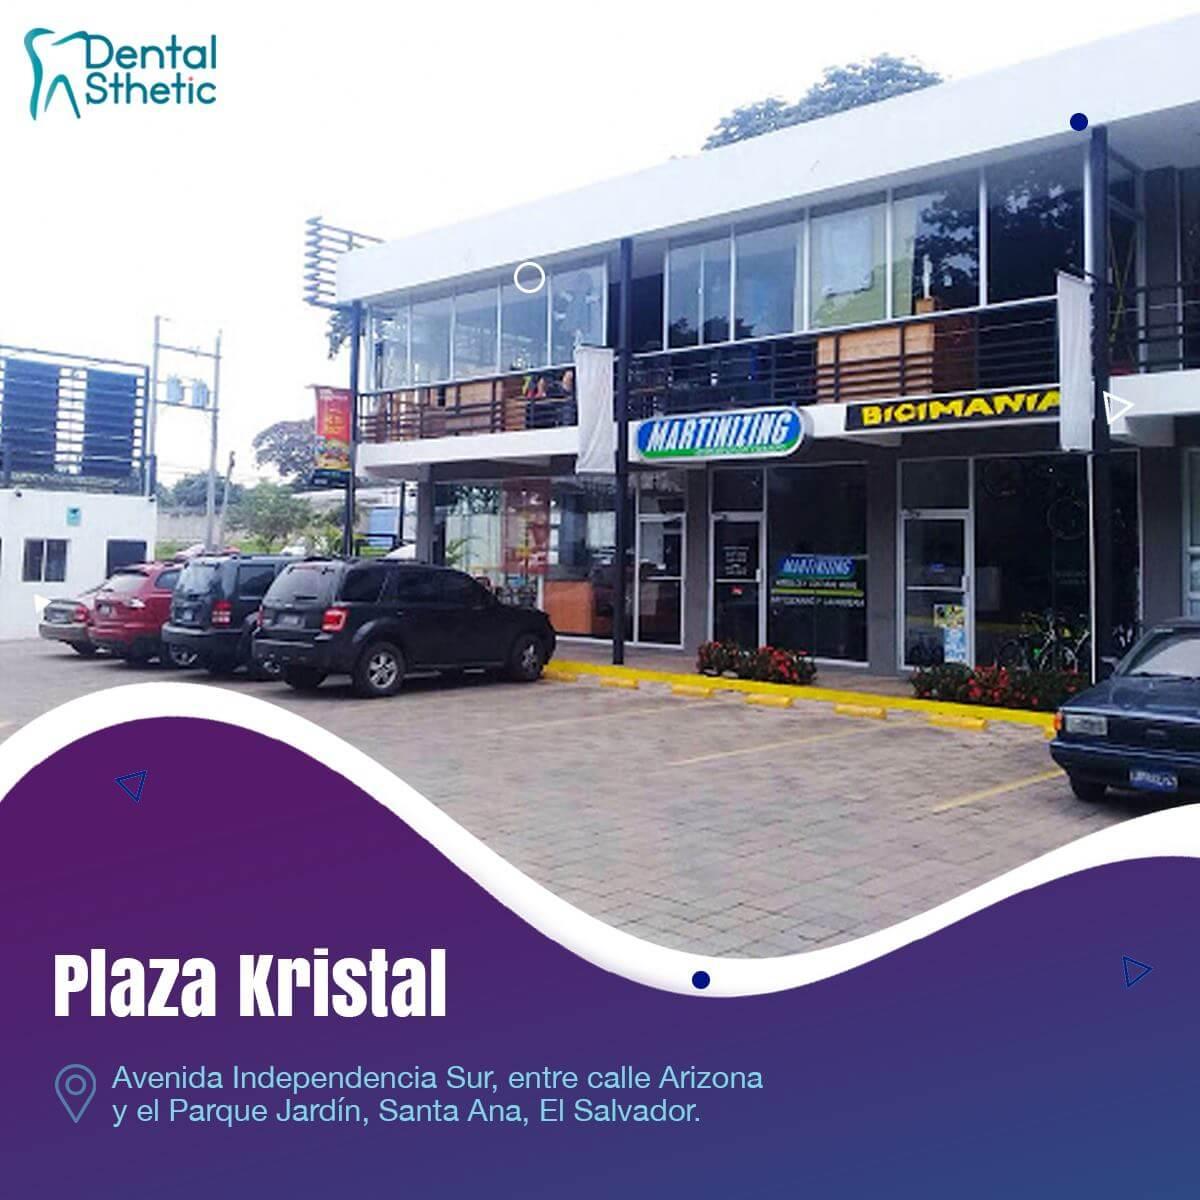 dental-esthetic-plaza-kristal-01